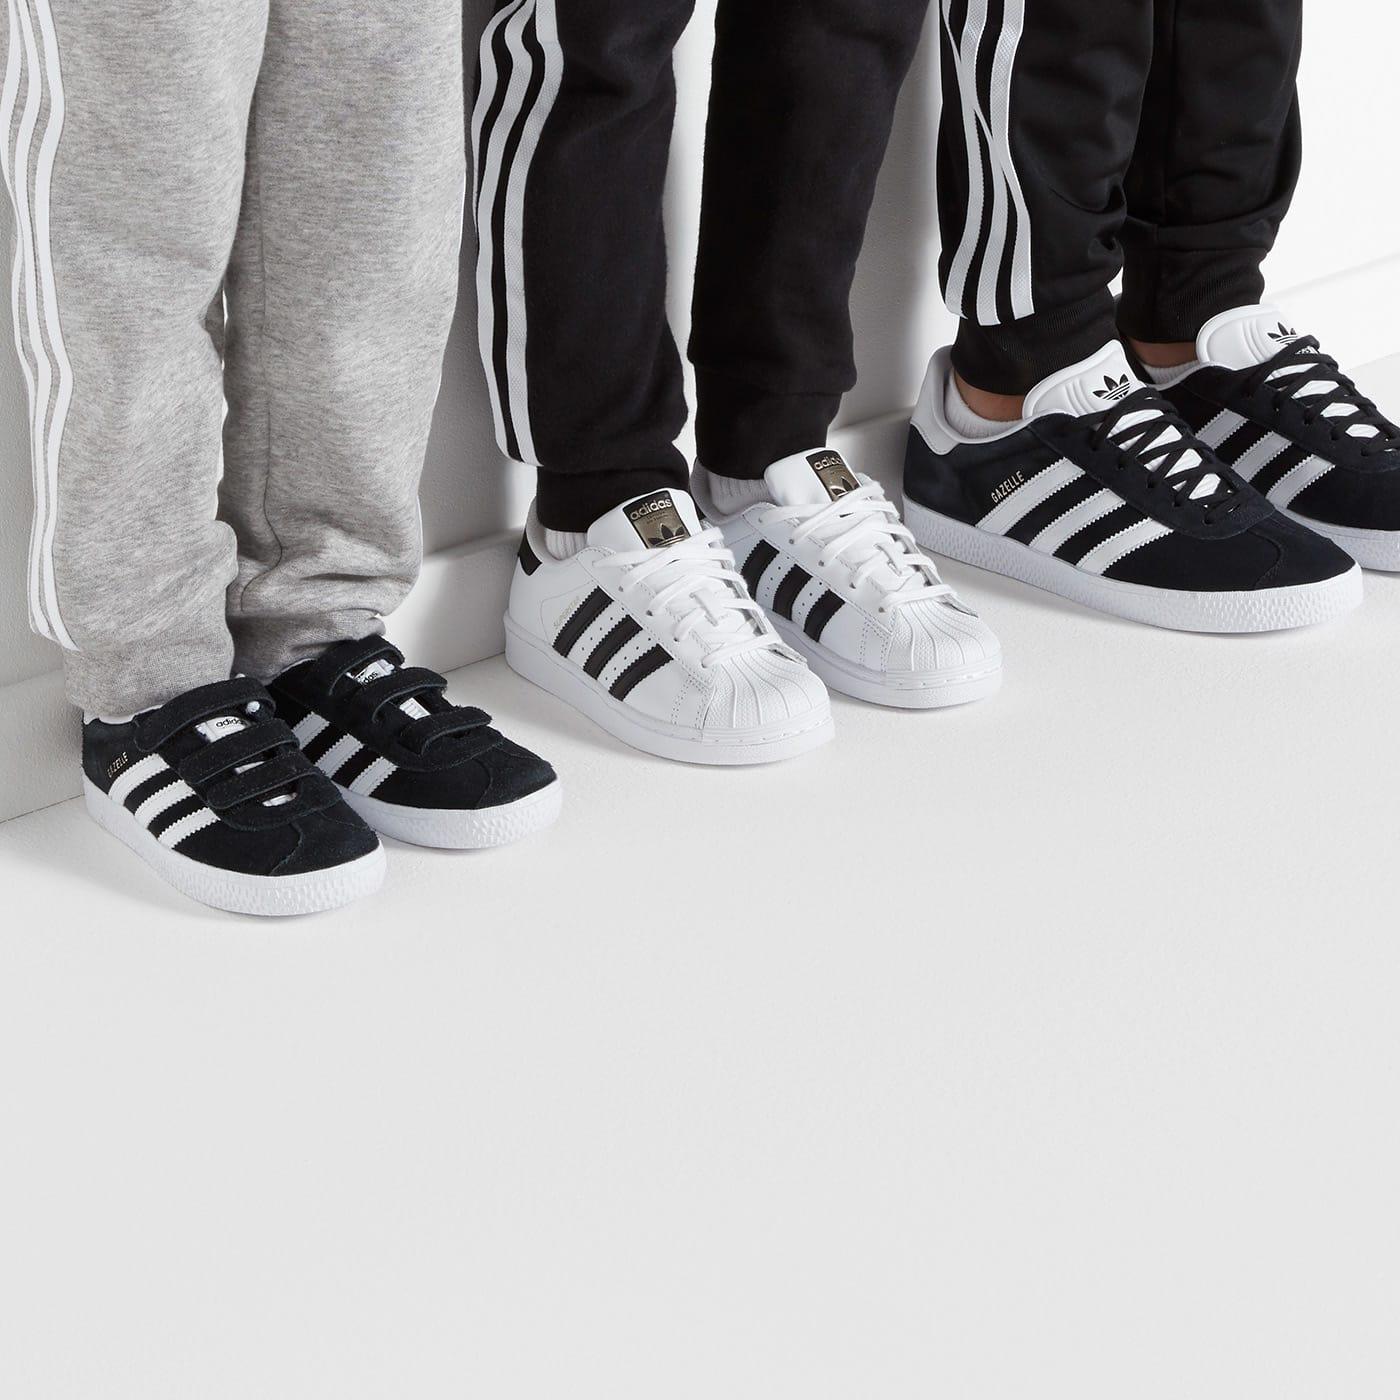 online retailer 79f43 db7e0 Kinder - Schuhe - Outlet  adidas AT